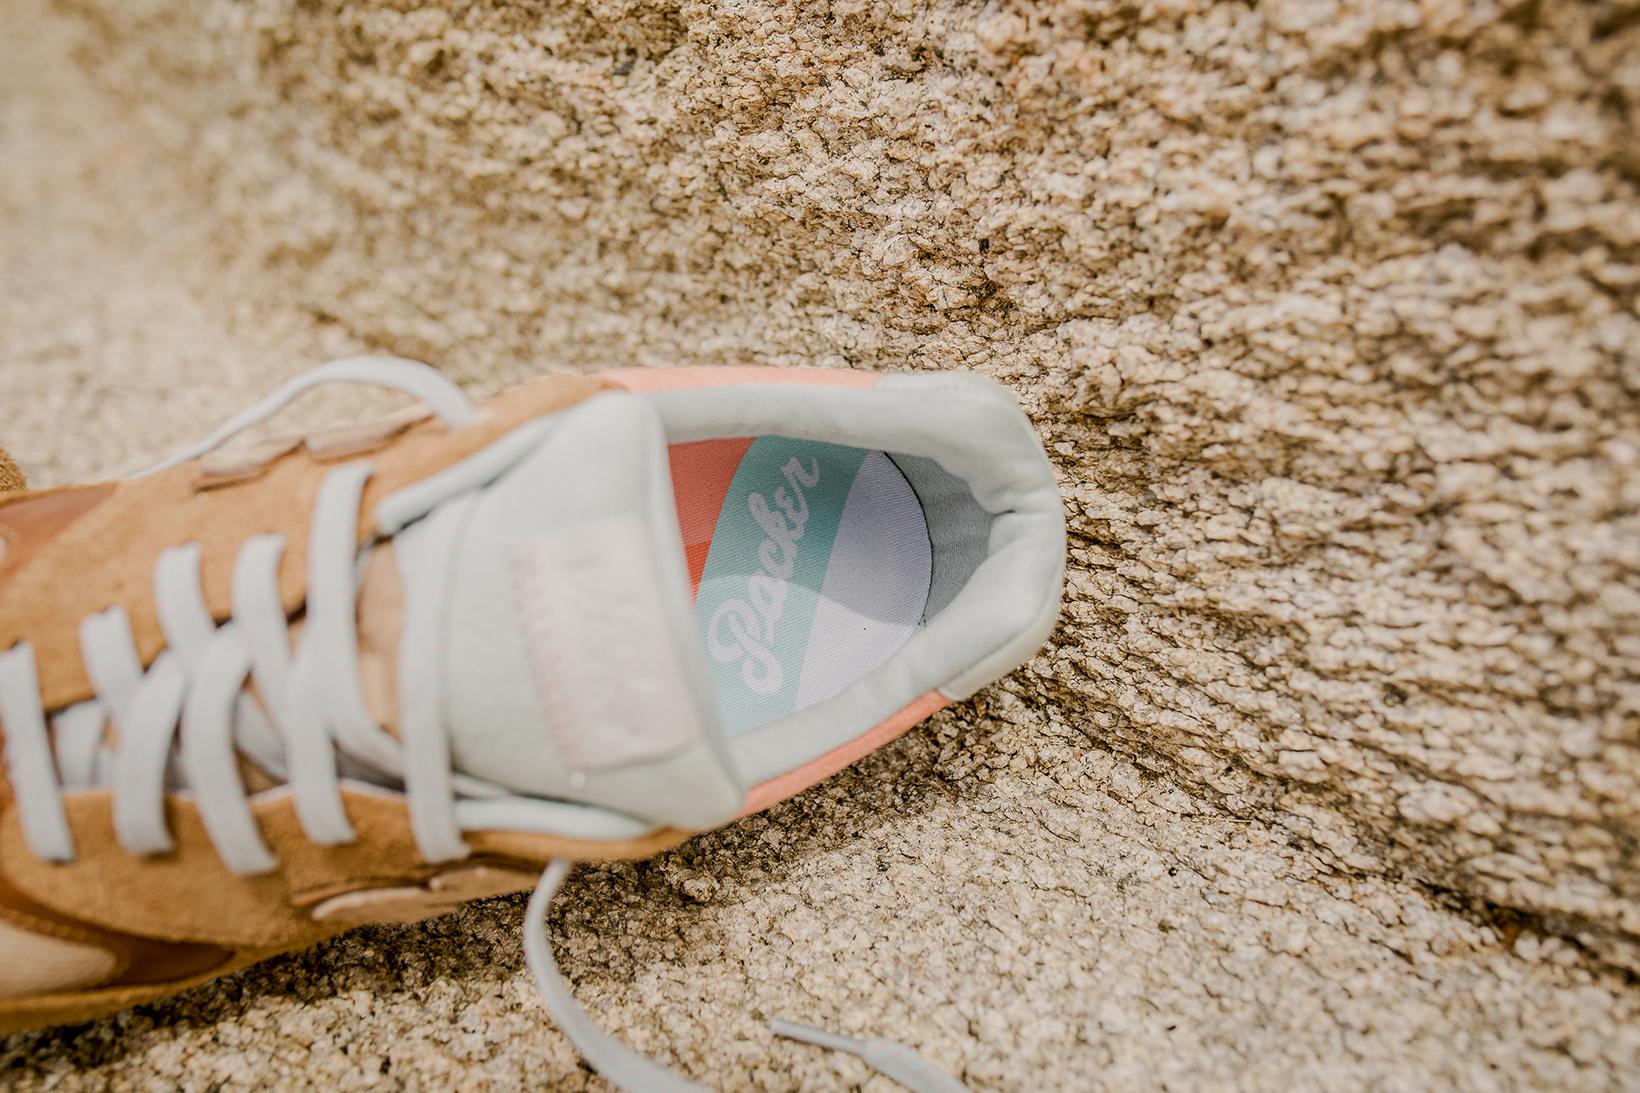 packer-shoes-new-balance-999-cml-6